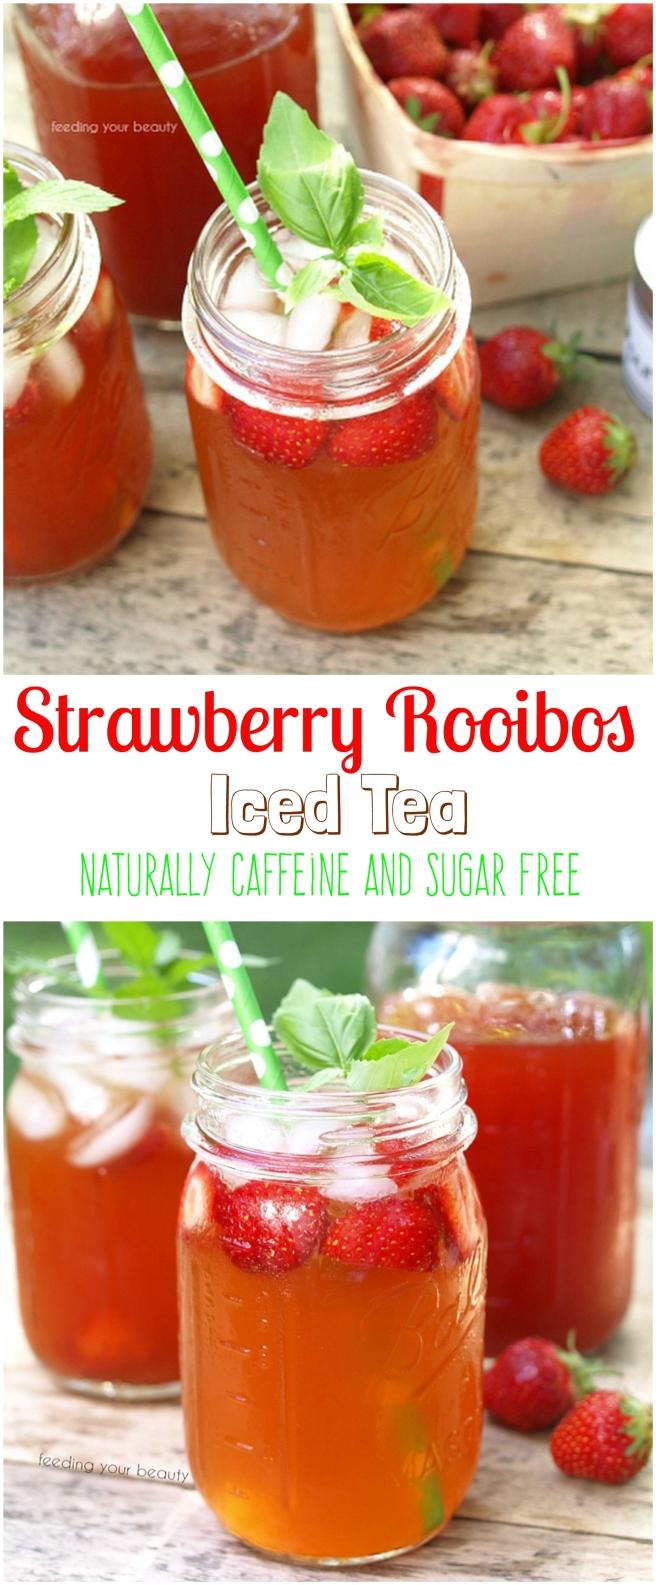 Beautifying Strawberry Rooibos Iced Tea - zero sugar or sweeteners, and naturally caffeine free